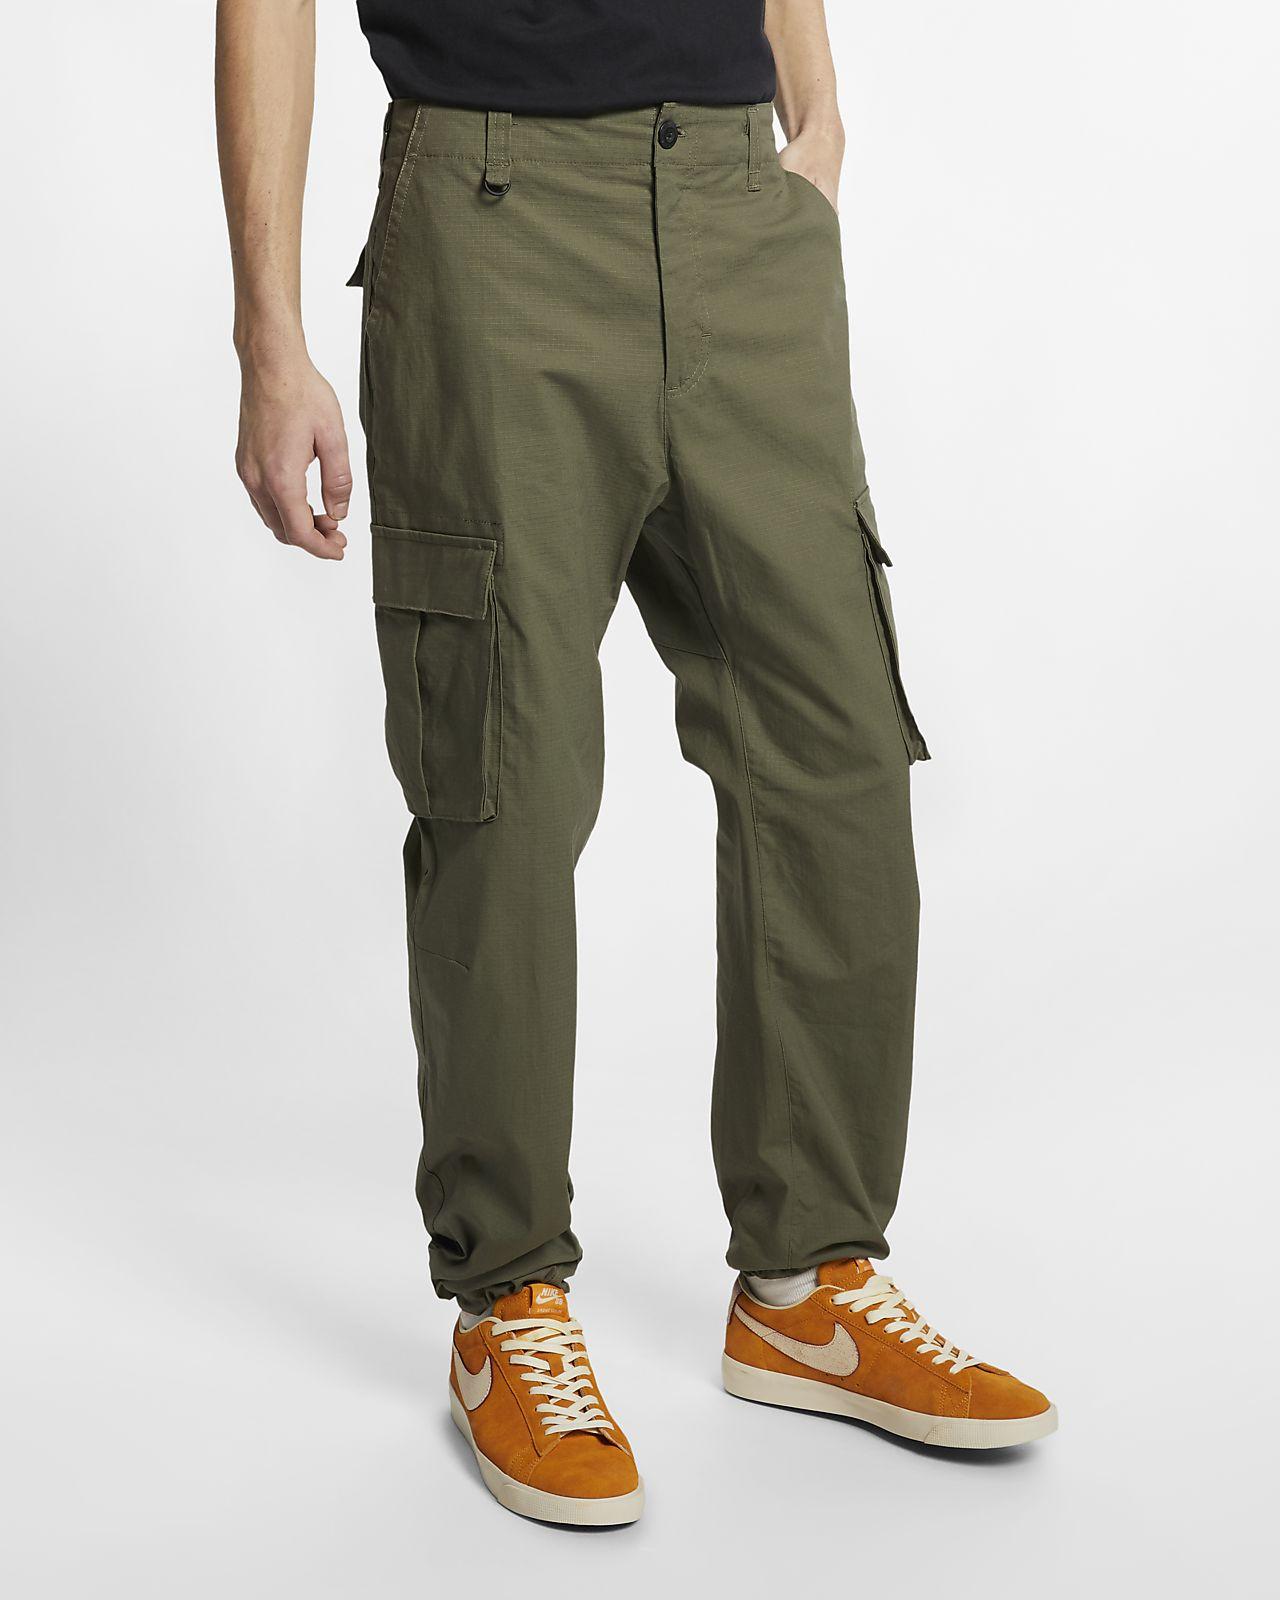 296ecd05cba5 Nike SB Flex FTM Men s Skate Cargo Pants. Nike.com